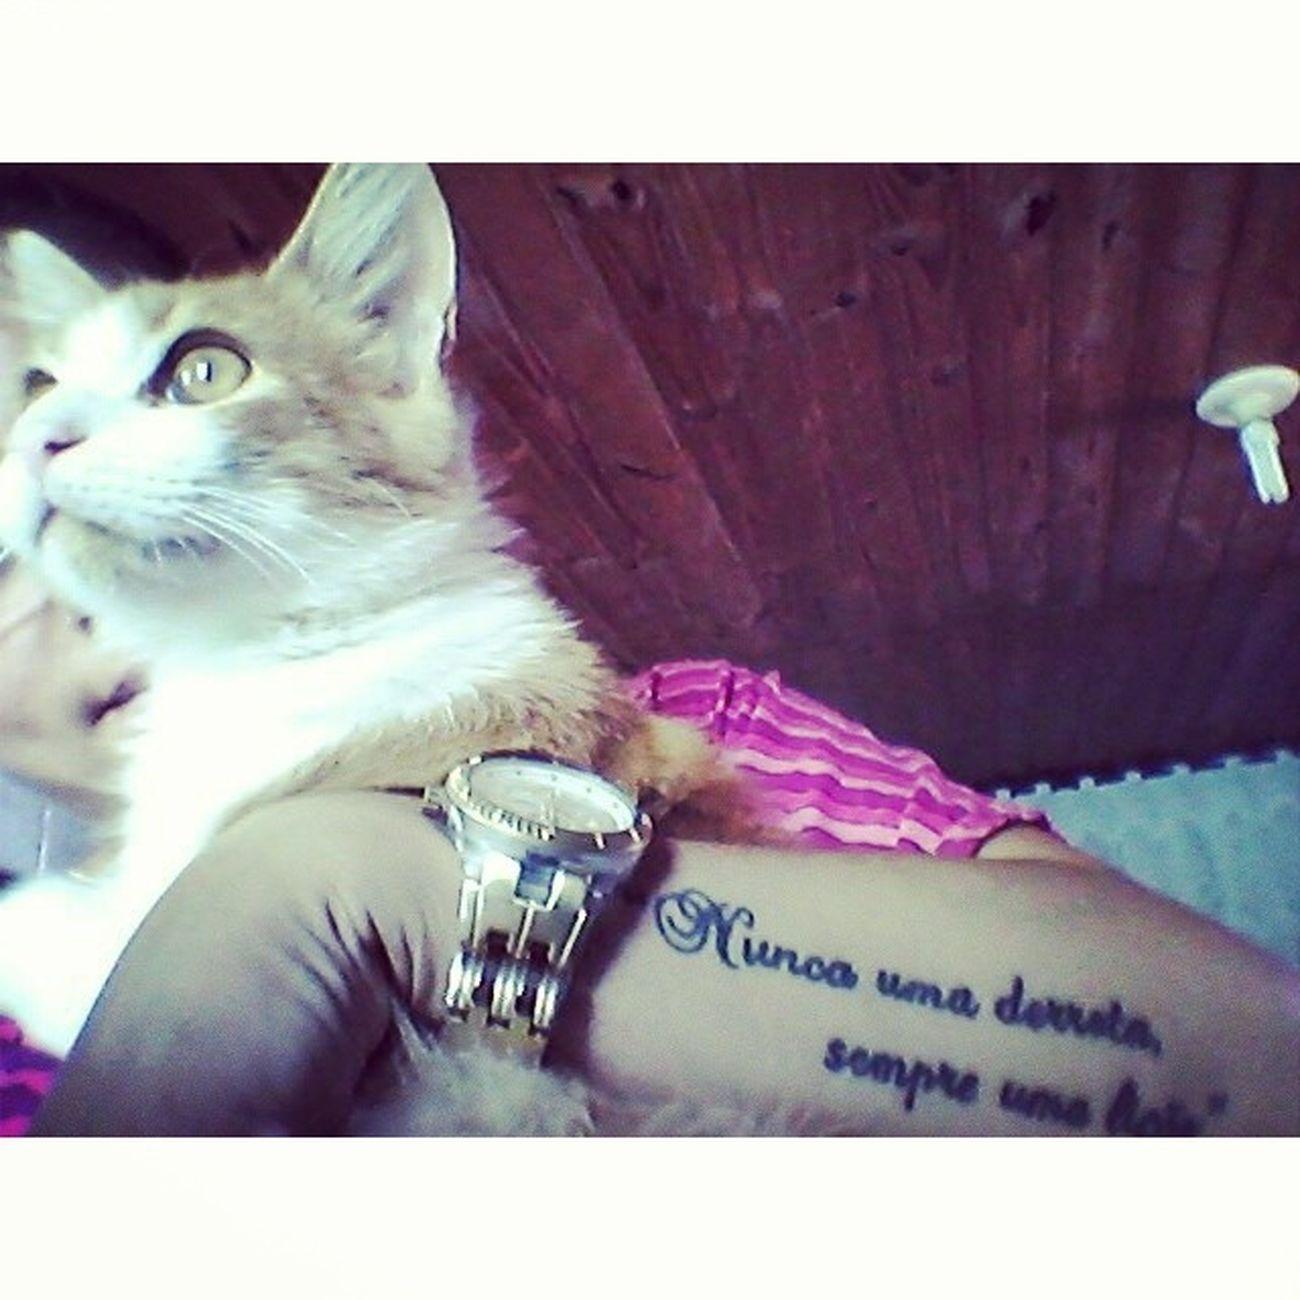 Oiiii Tön Zuiudinho Adoro Cat lovecat